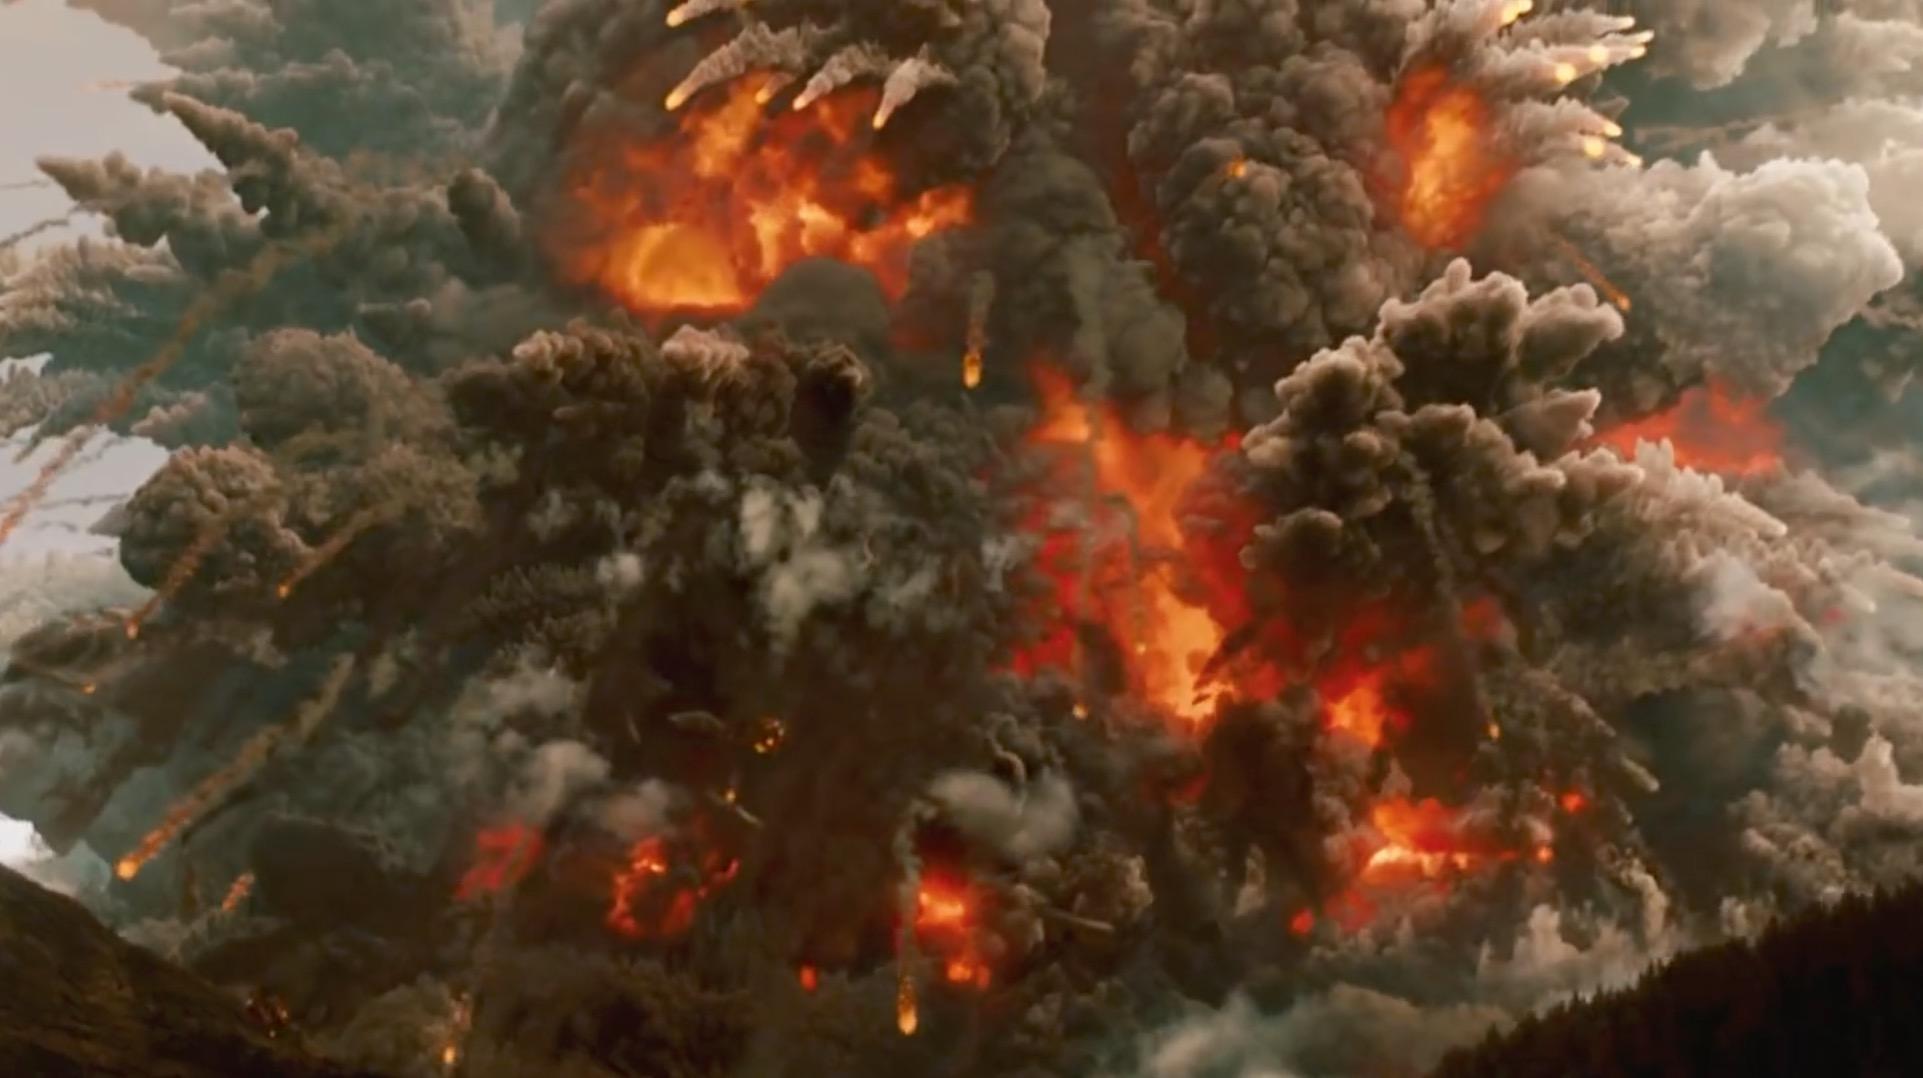 yellowstone eruption 2012 climate change dispatch